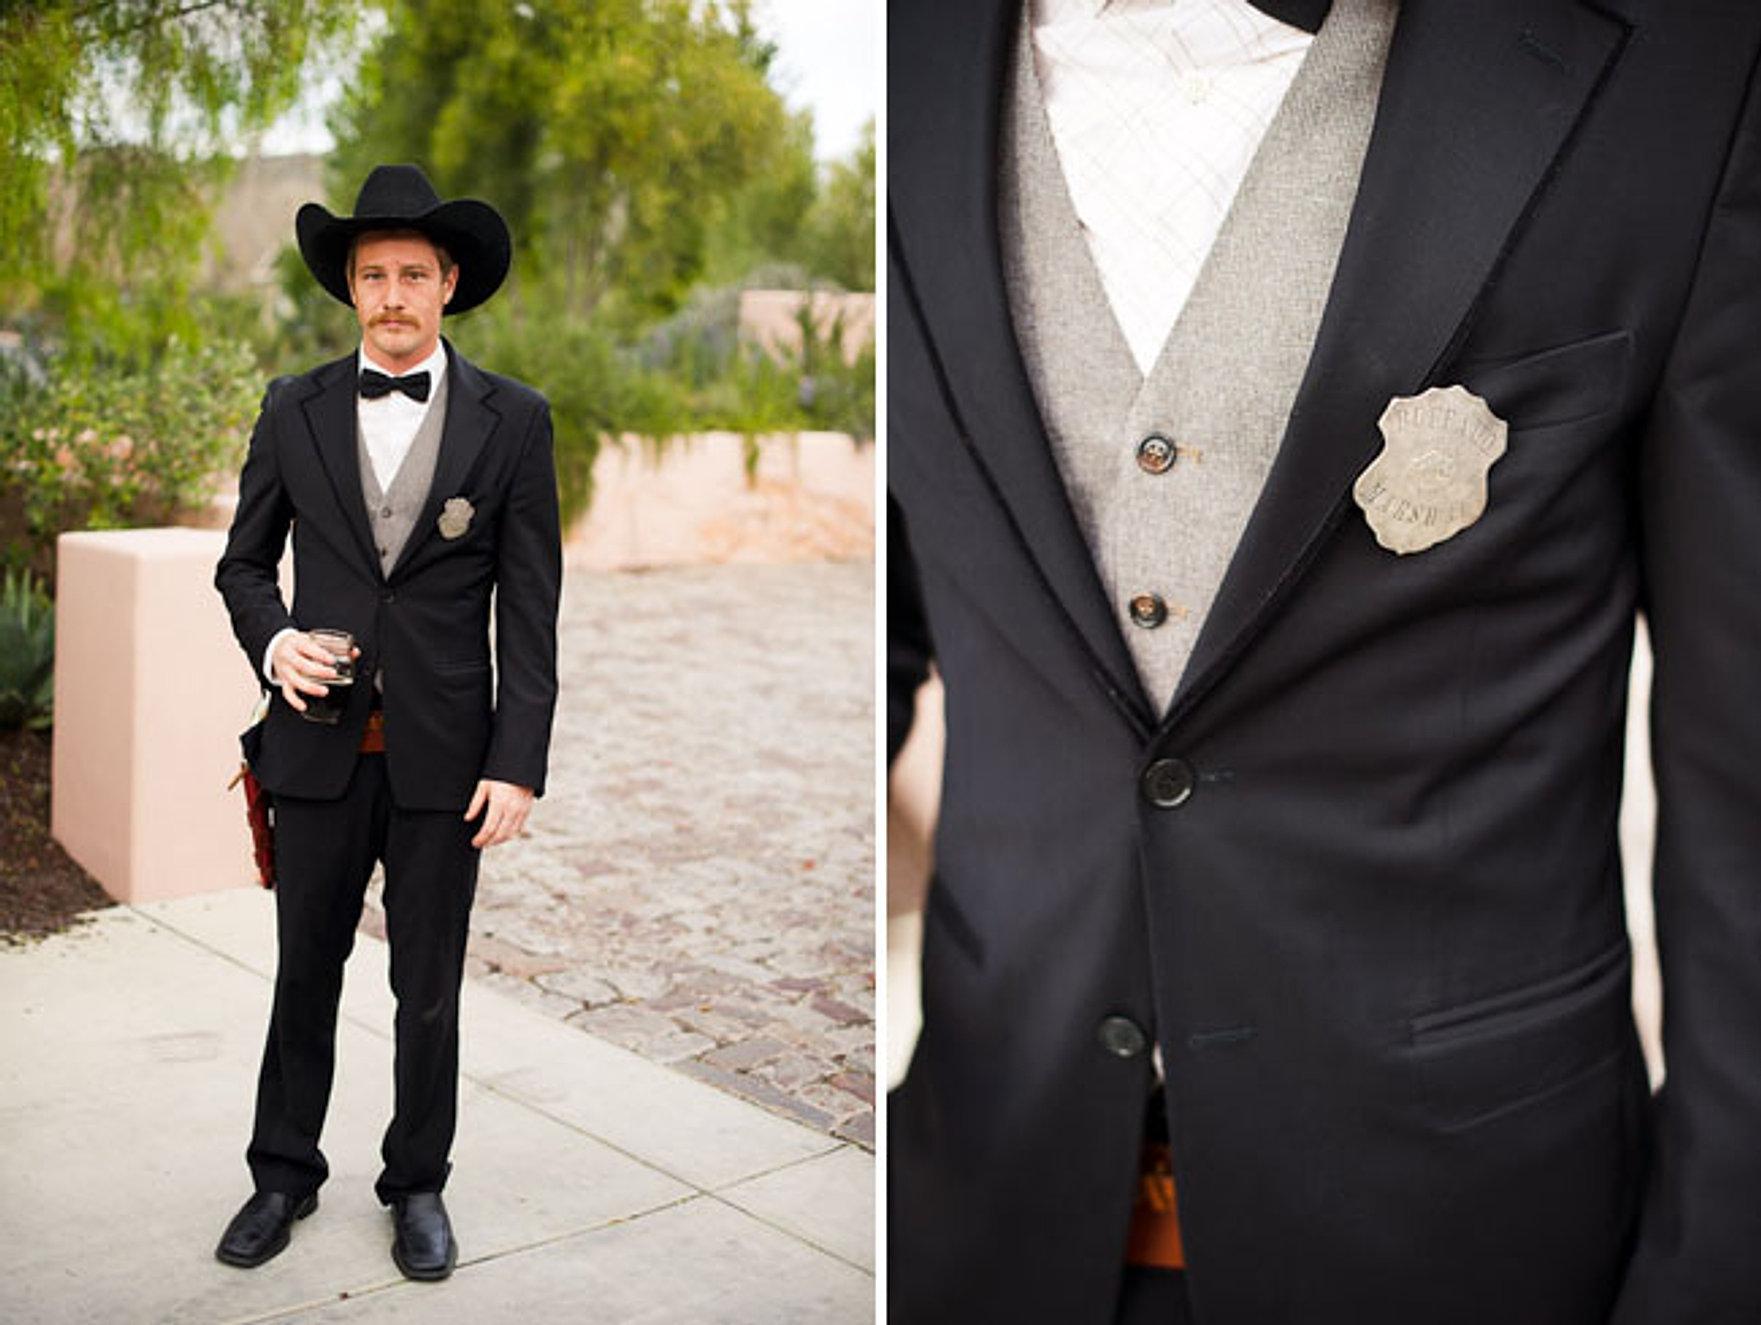 Stunning Western Wedding Suit Images - Wedding Dress Ideas ...